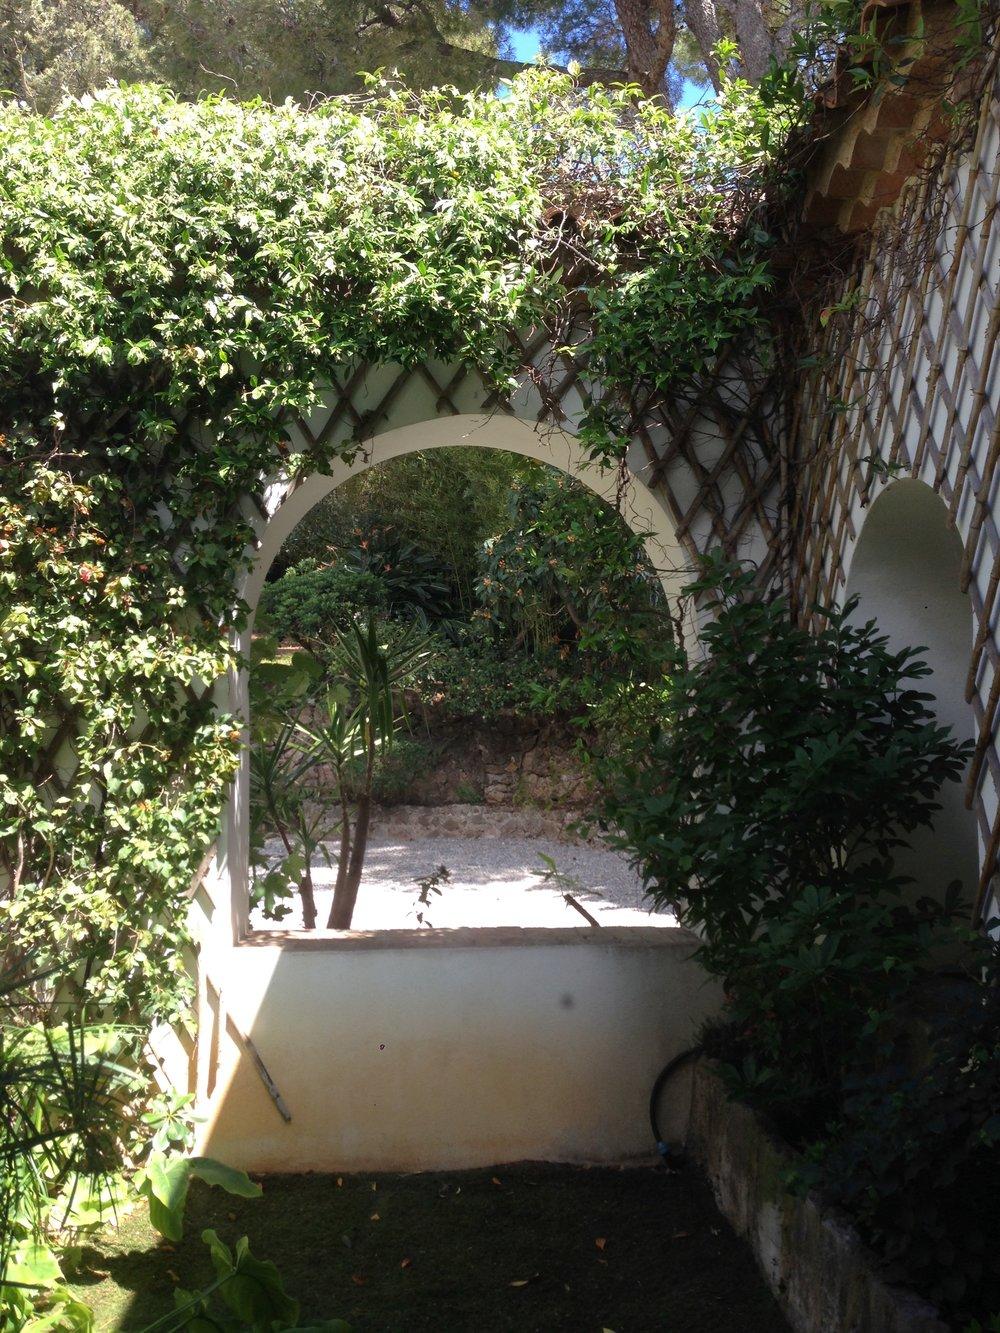 The courtyard at Villa Santo Sospir, with bamboo trellis, climbing vines and Cocteau mosaic, illustrated below.